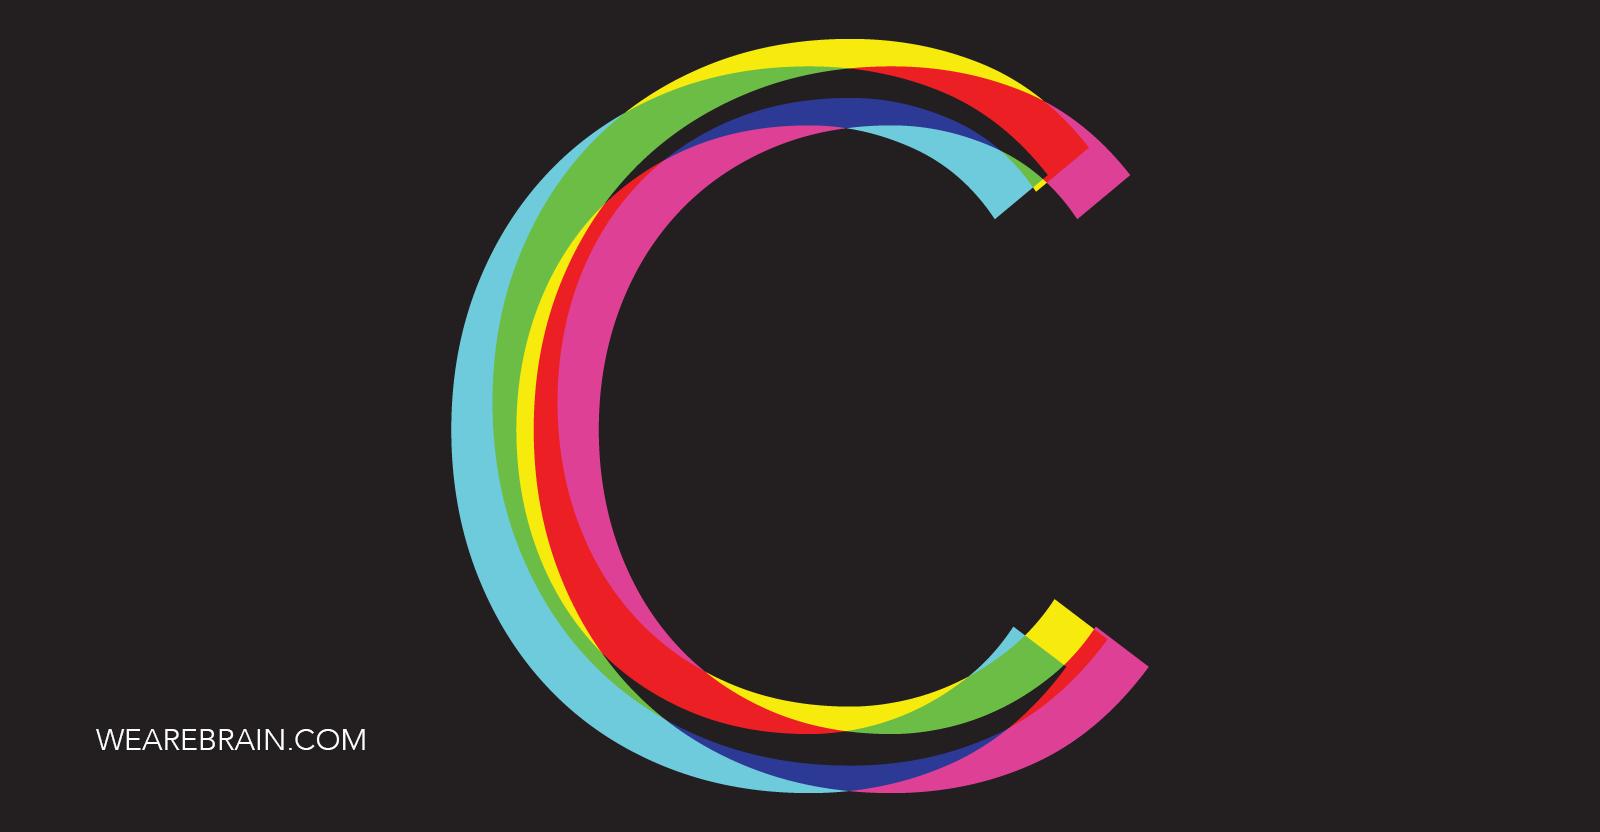 illustration of the letter C